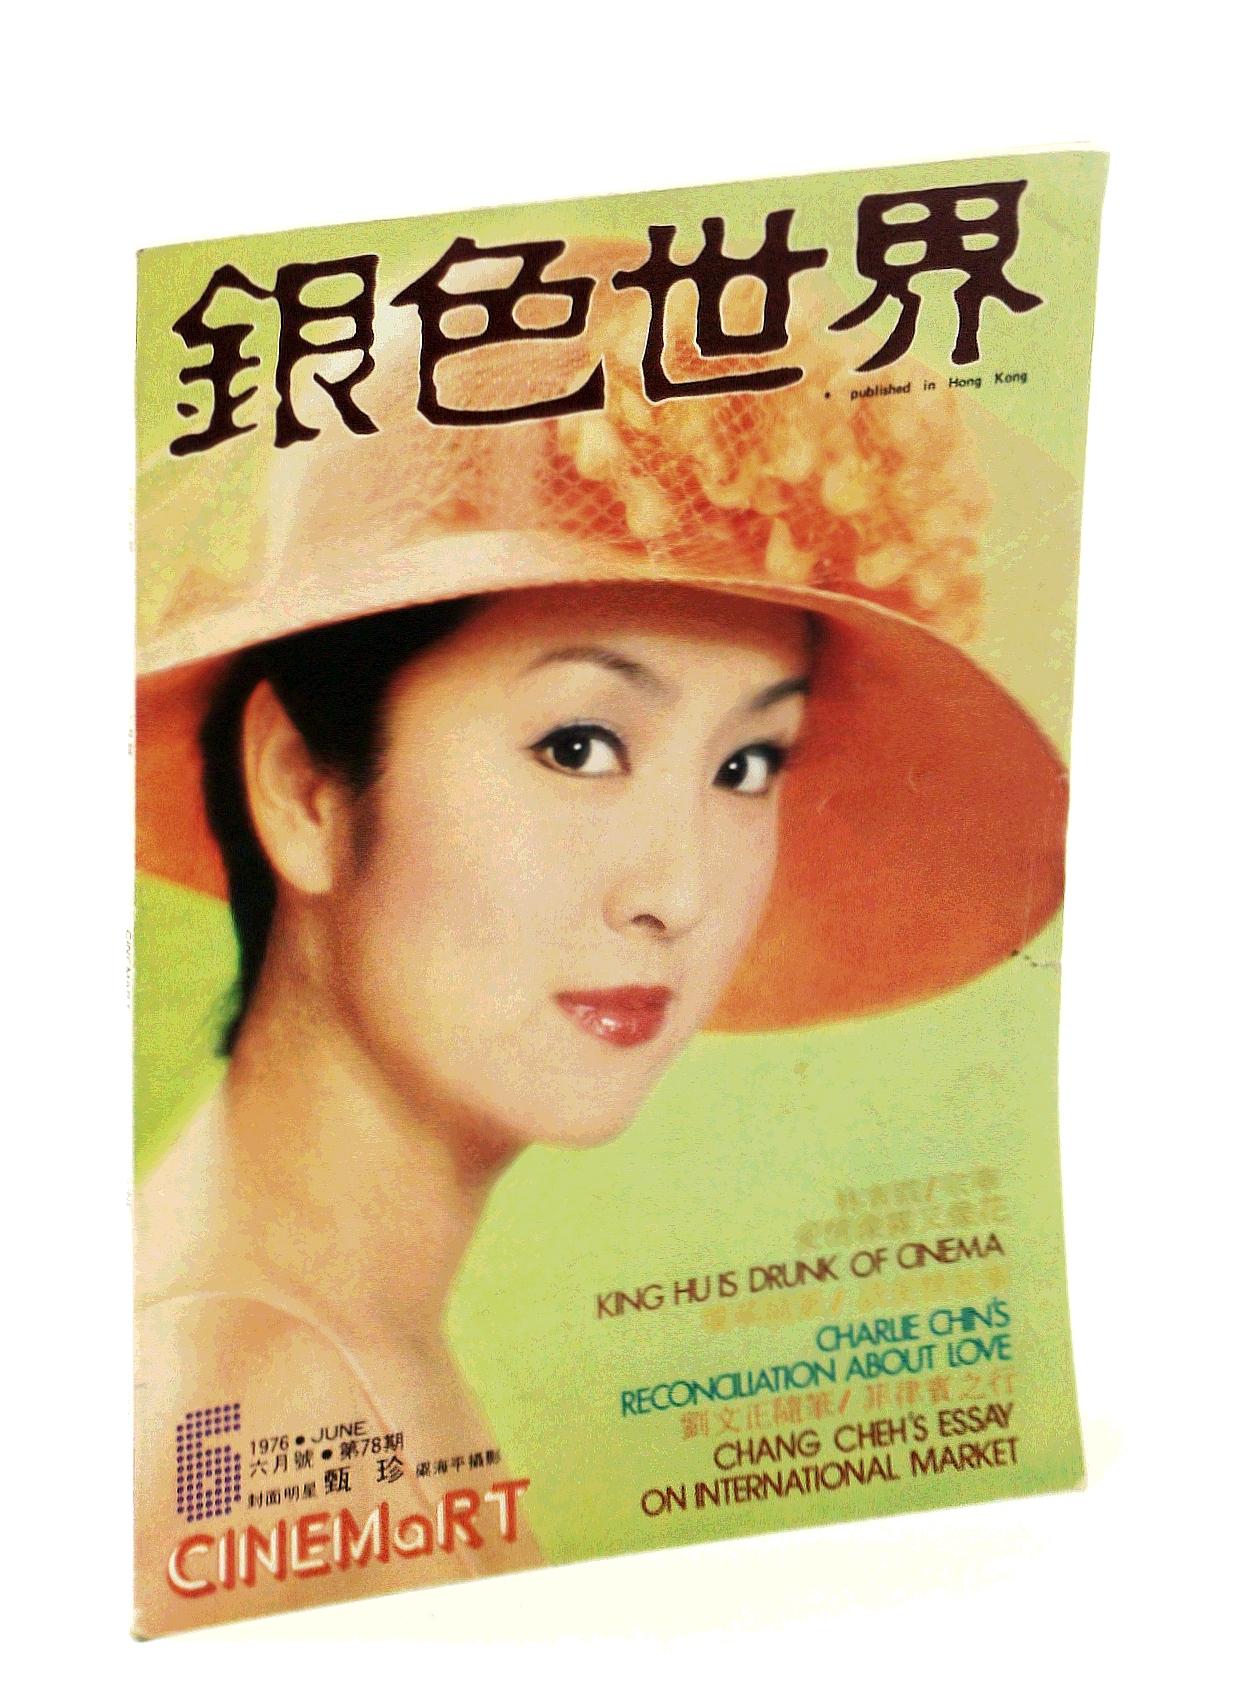 Image for Cinemart - The Most Authoritative Mandarin Movie Magazine, June 1976, No. 78